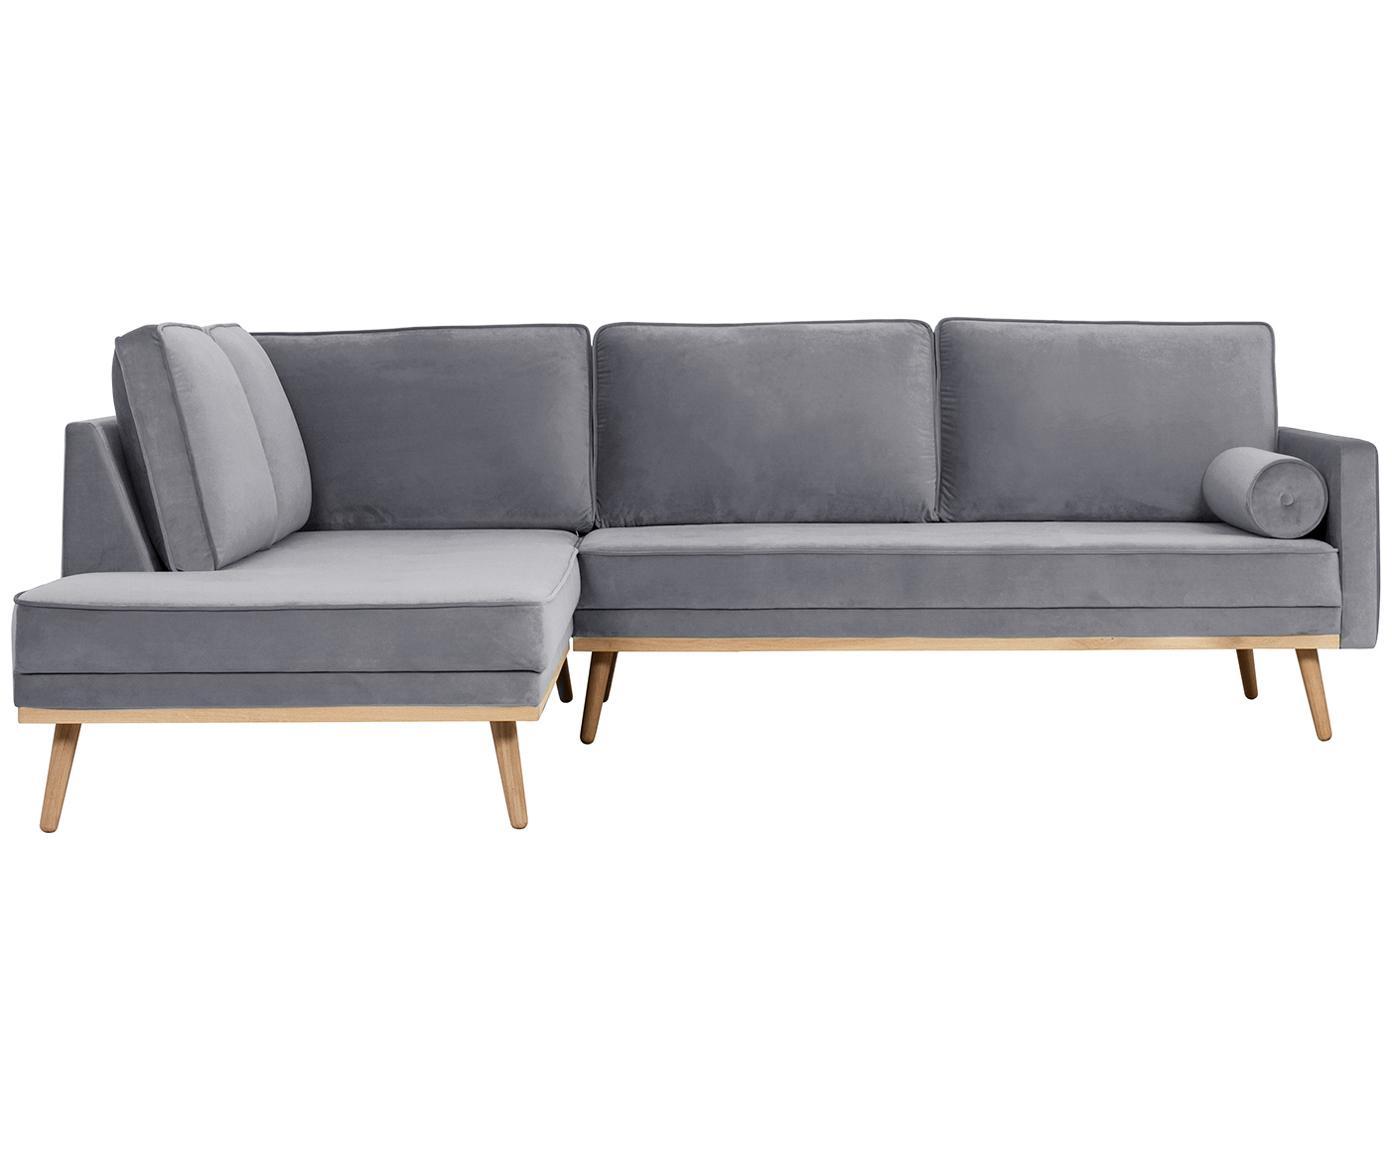 Samt-Ecksofa Saint (3-Sitzer), Bezug: Samt (Polyester) 35.000 S, Gestell: Massives Eichenholz, Span, Samt Grau, B 243 x T 220 cm